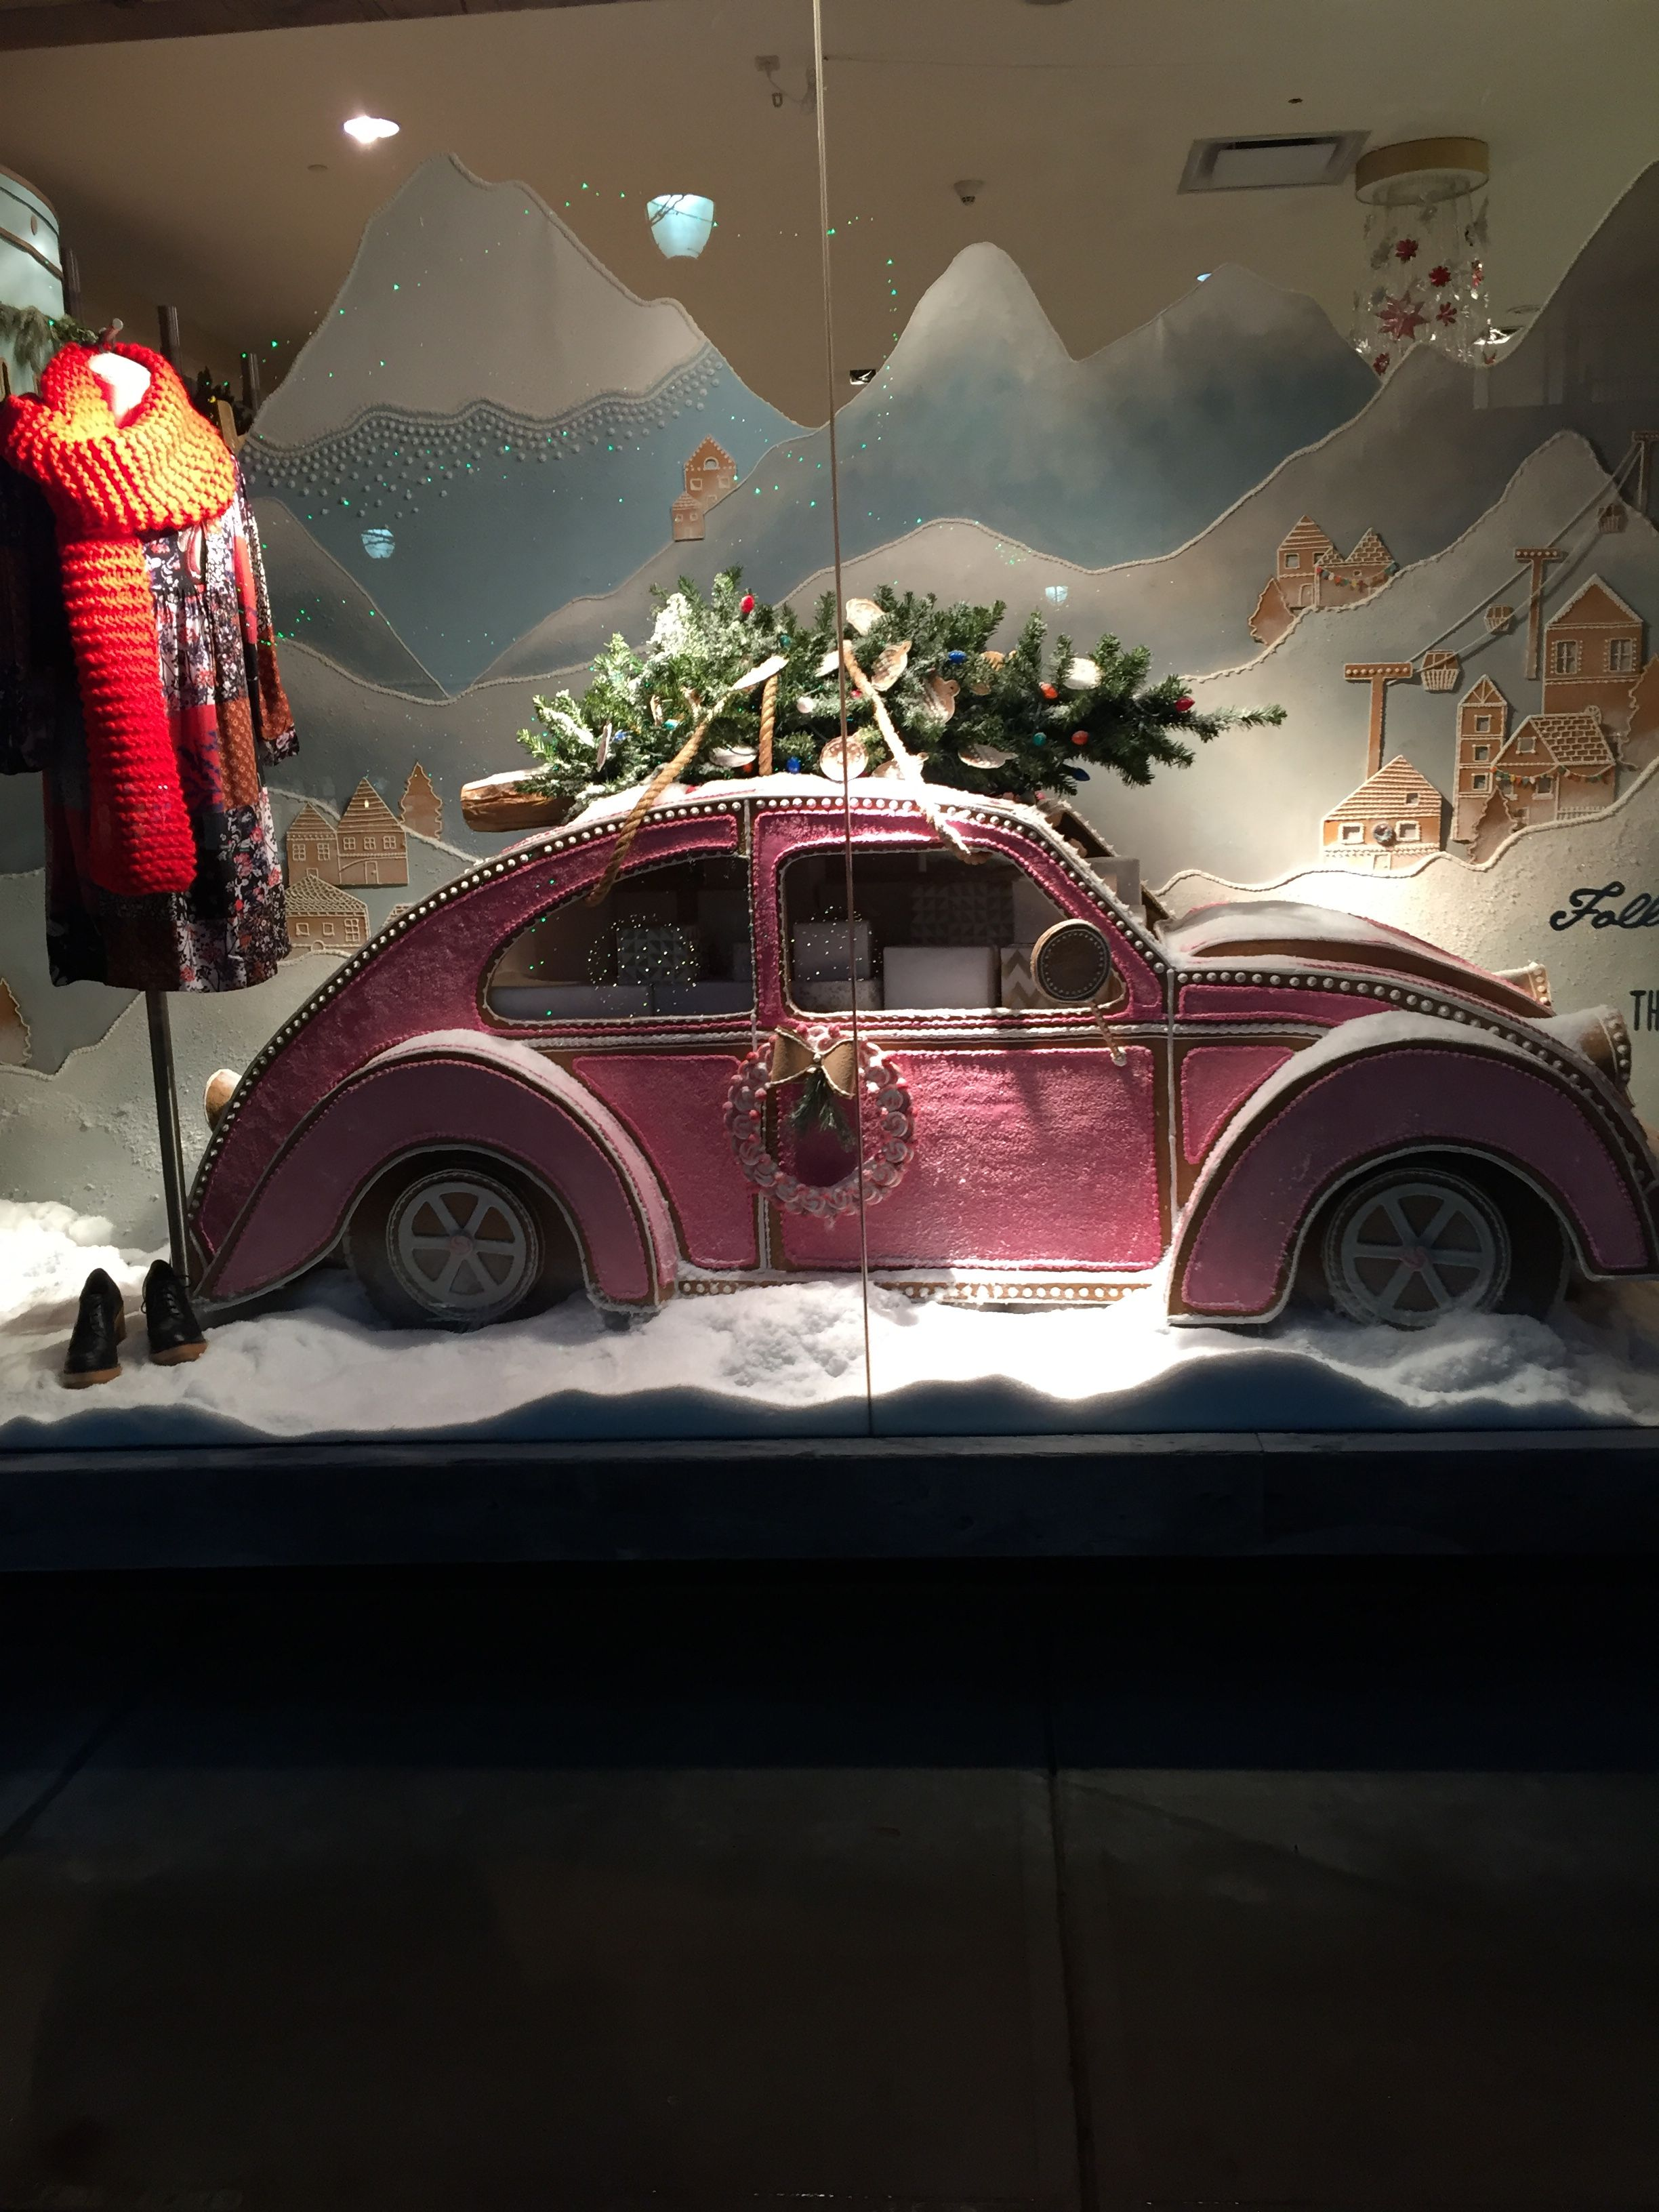 anthropologie window 2015 christmas retail window displays decora o de natal montras vitrine. Black Bedroom Furniture Sets. Home Design Ideas